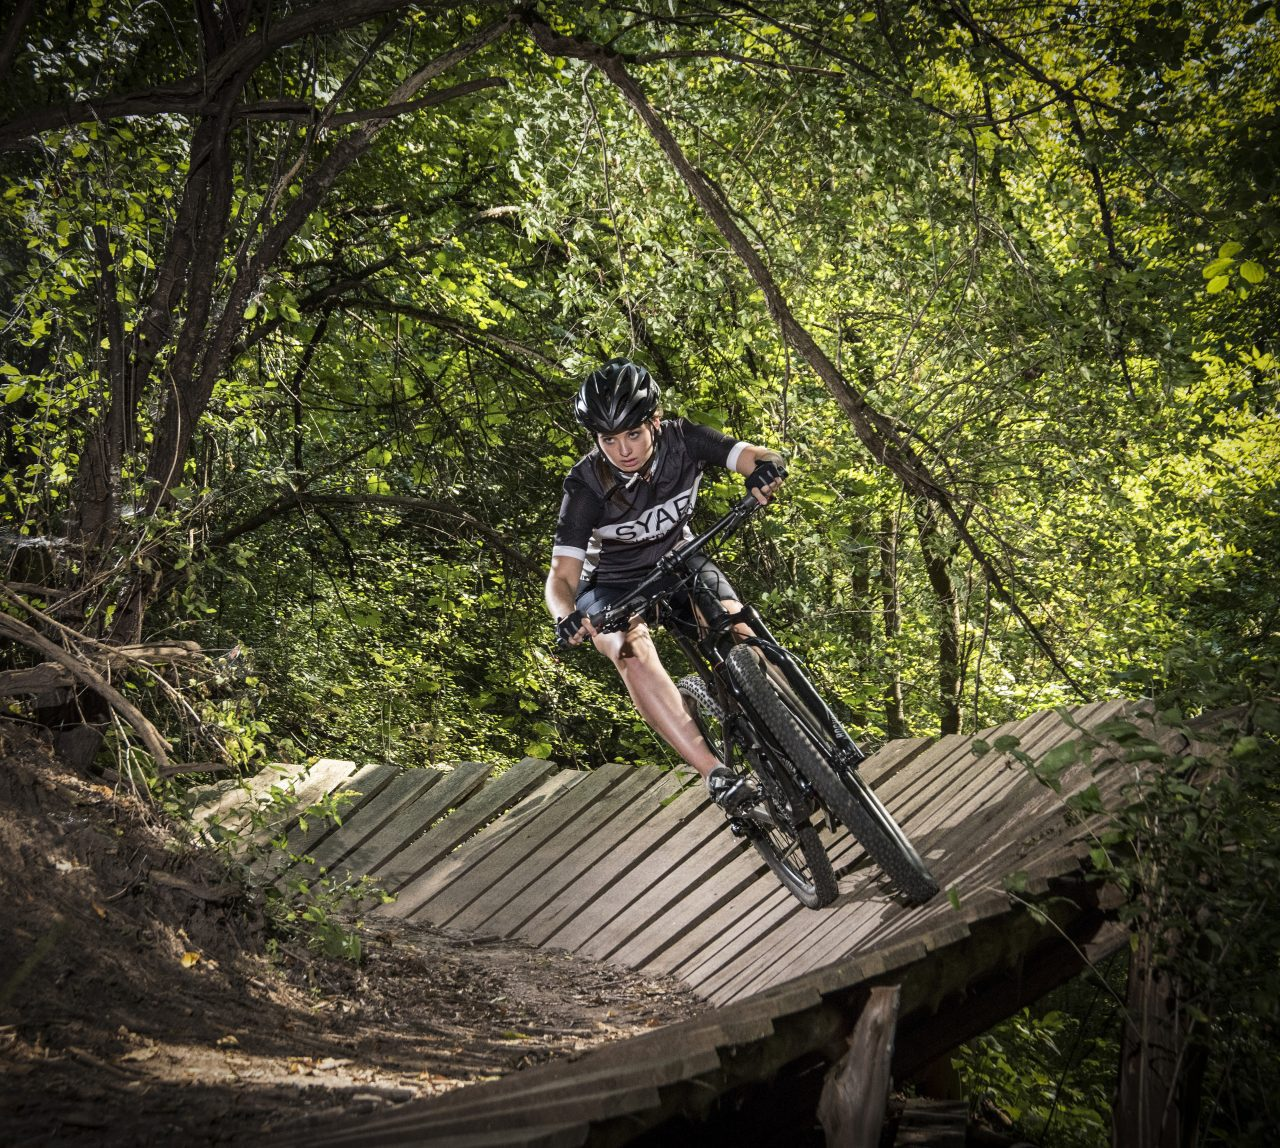 trail riding, sports